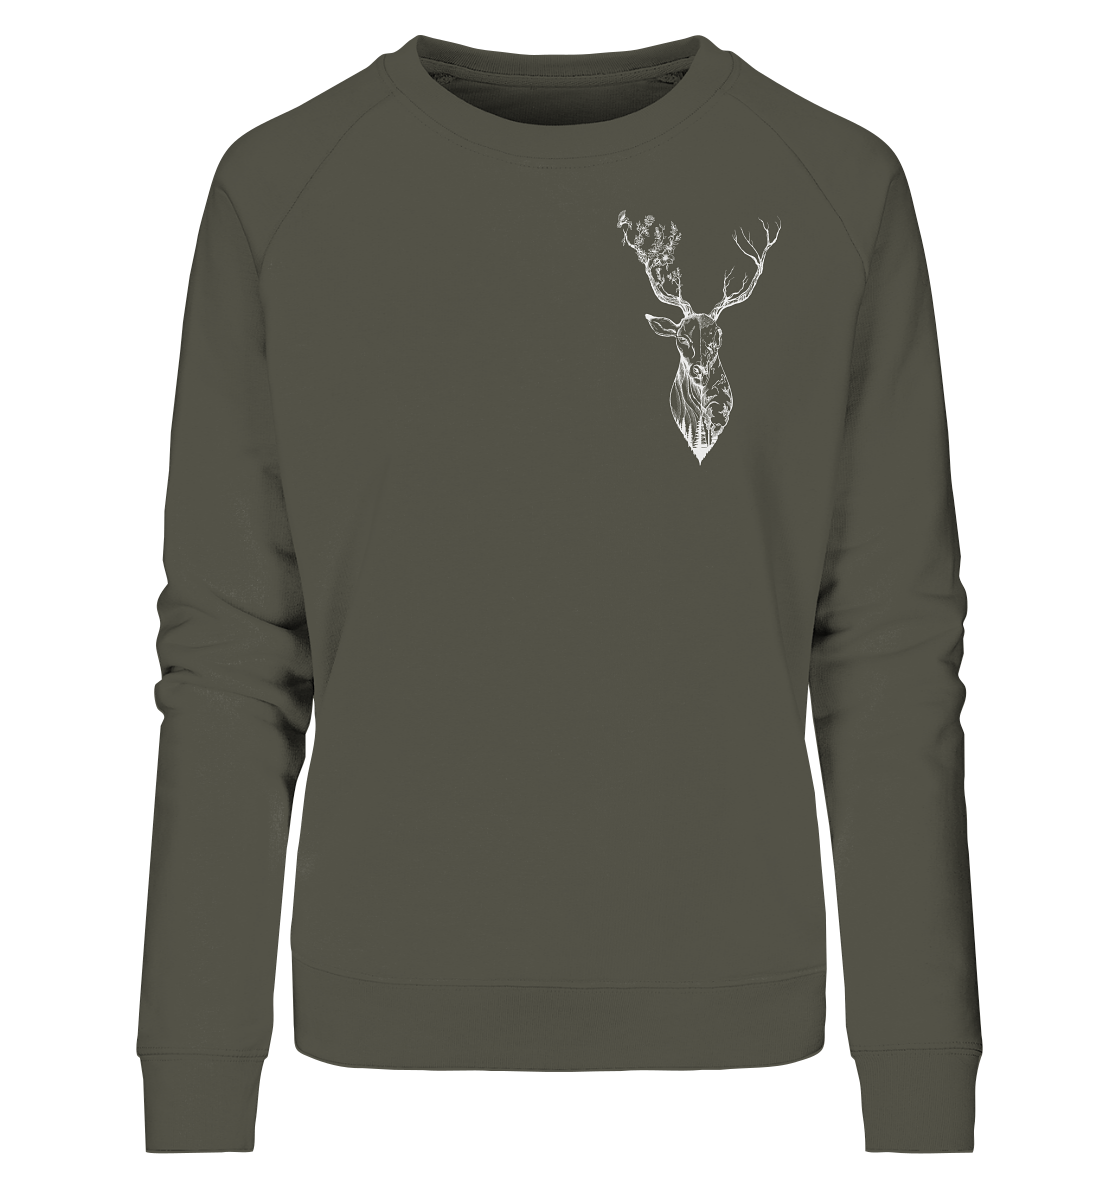 front-ladies-organic-sweatshirt-545348-1116x-6.png